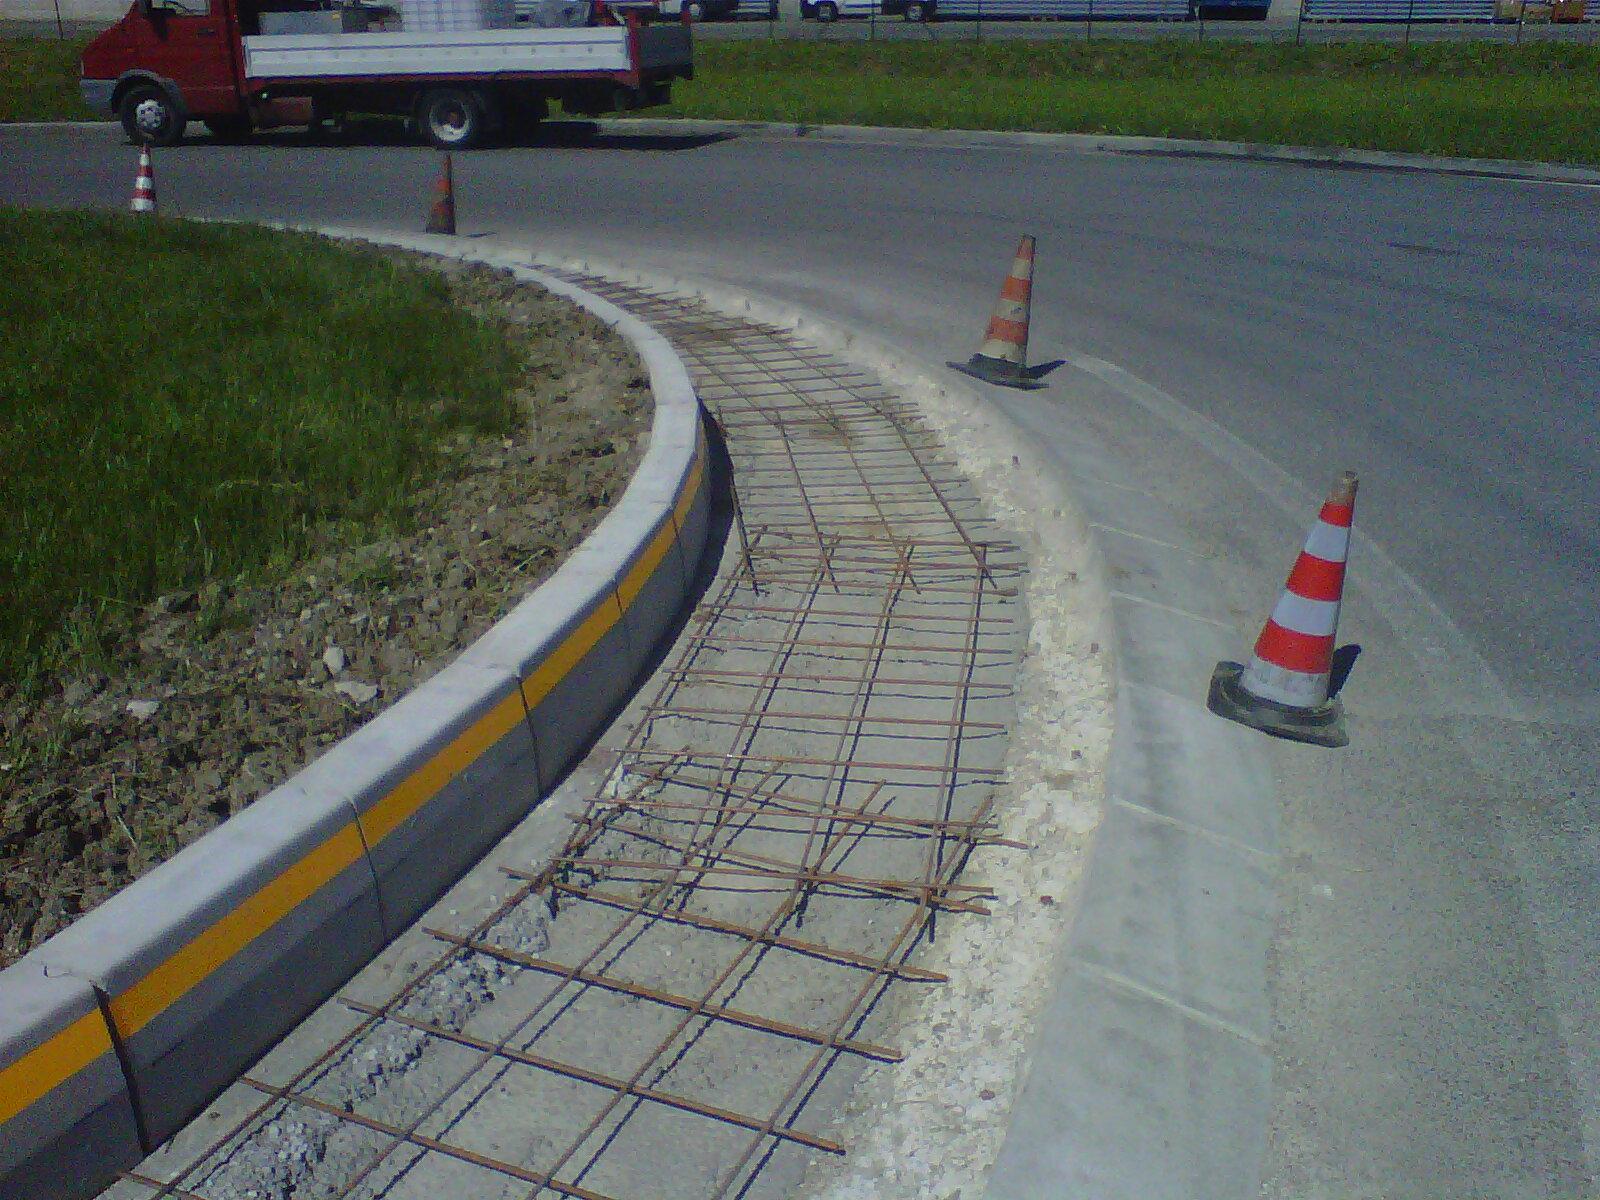 CORDILI 3M - Cordoli stradali strade